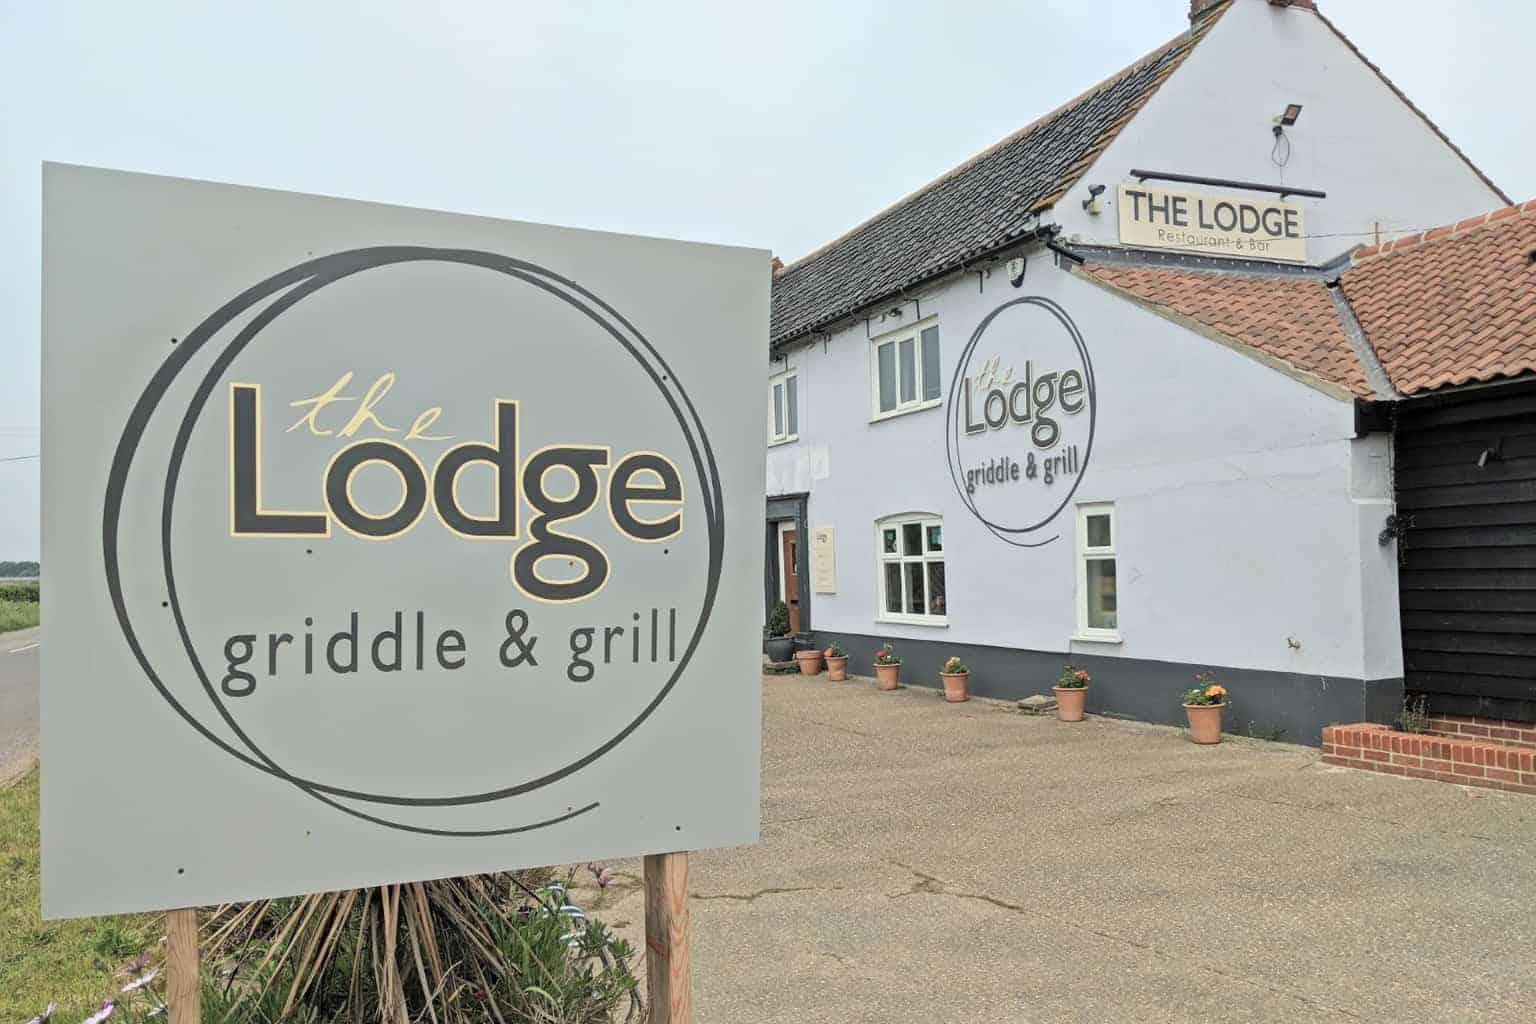 The Lodge Griddle & Grill // North Tuddenham, Norwich